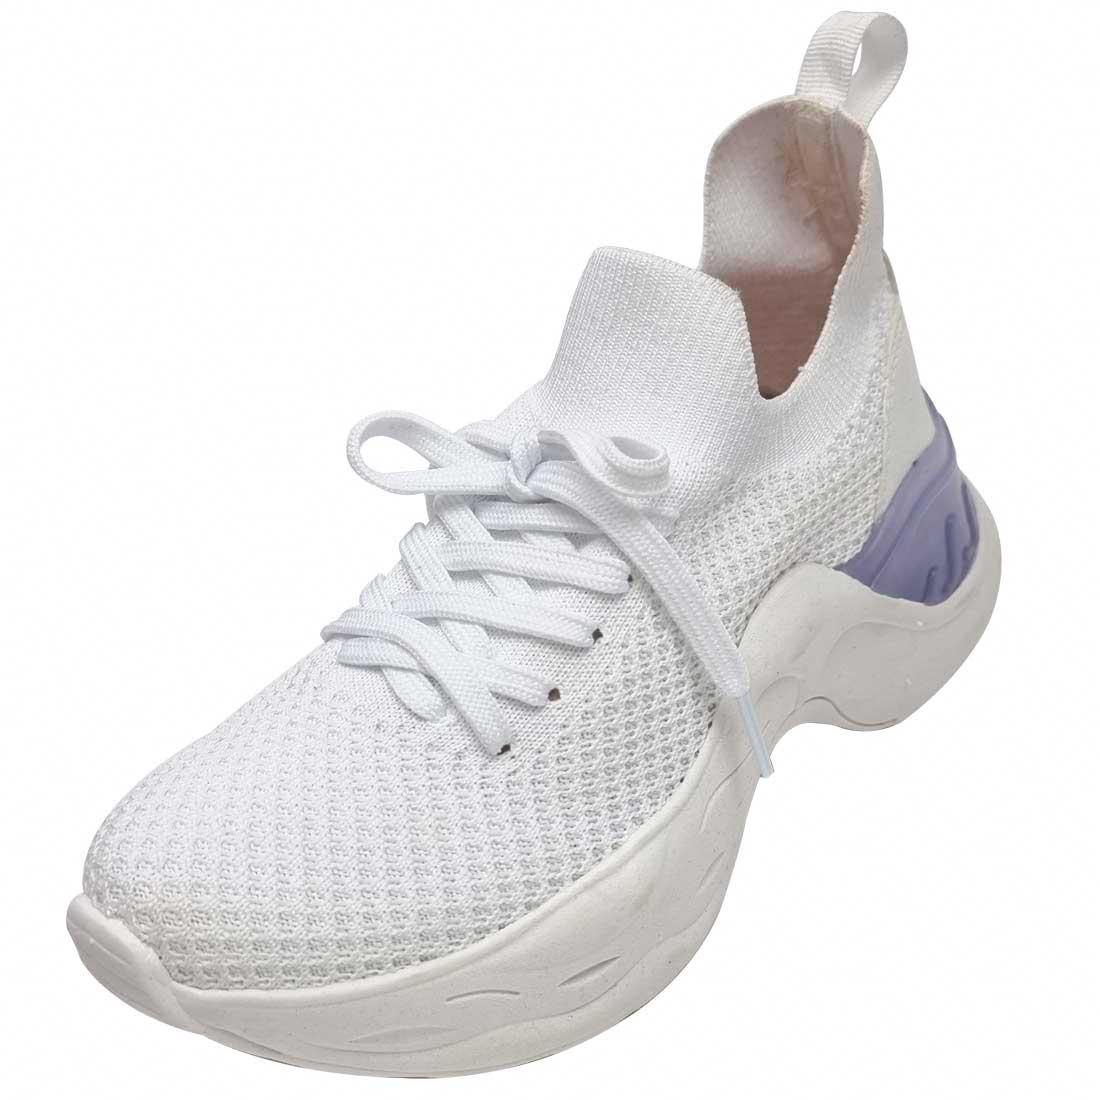 Tênis Meia Knit Comfort - Branco